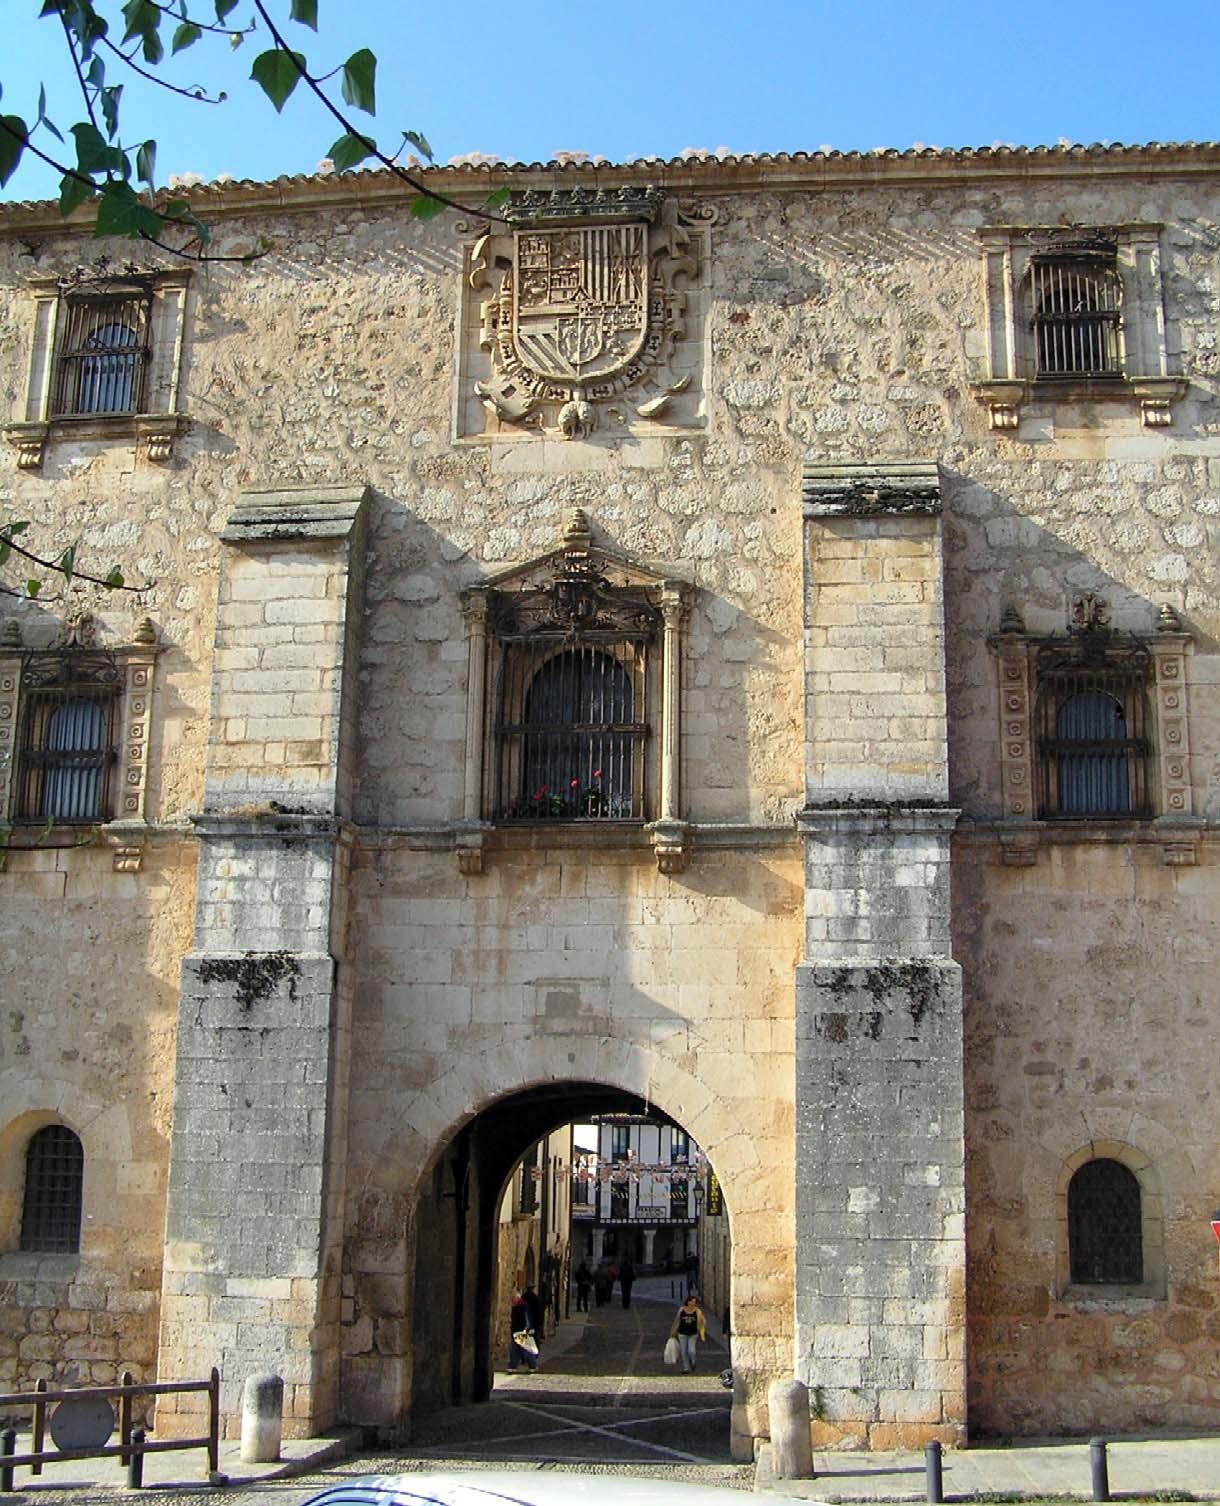 Se or o de covarrubias burgos portal fuenterrebollo for Oficina turismo burgos